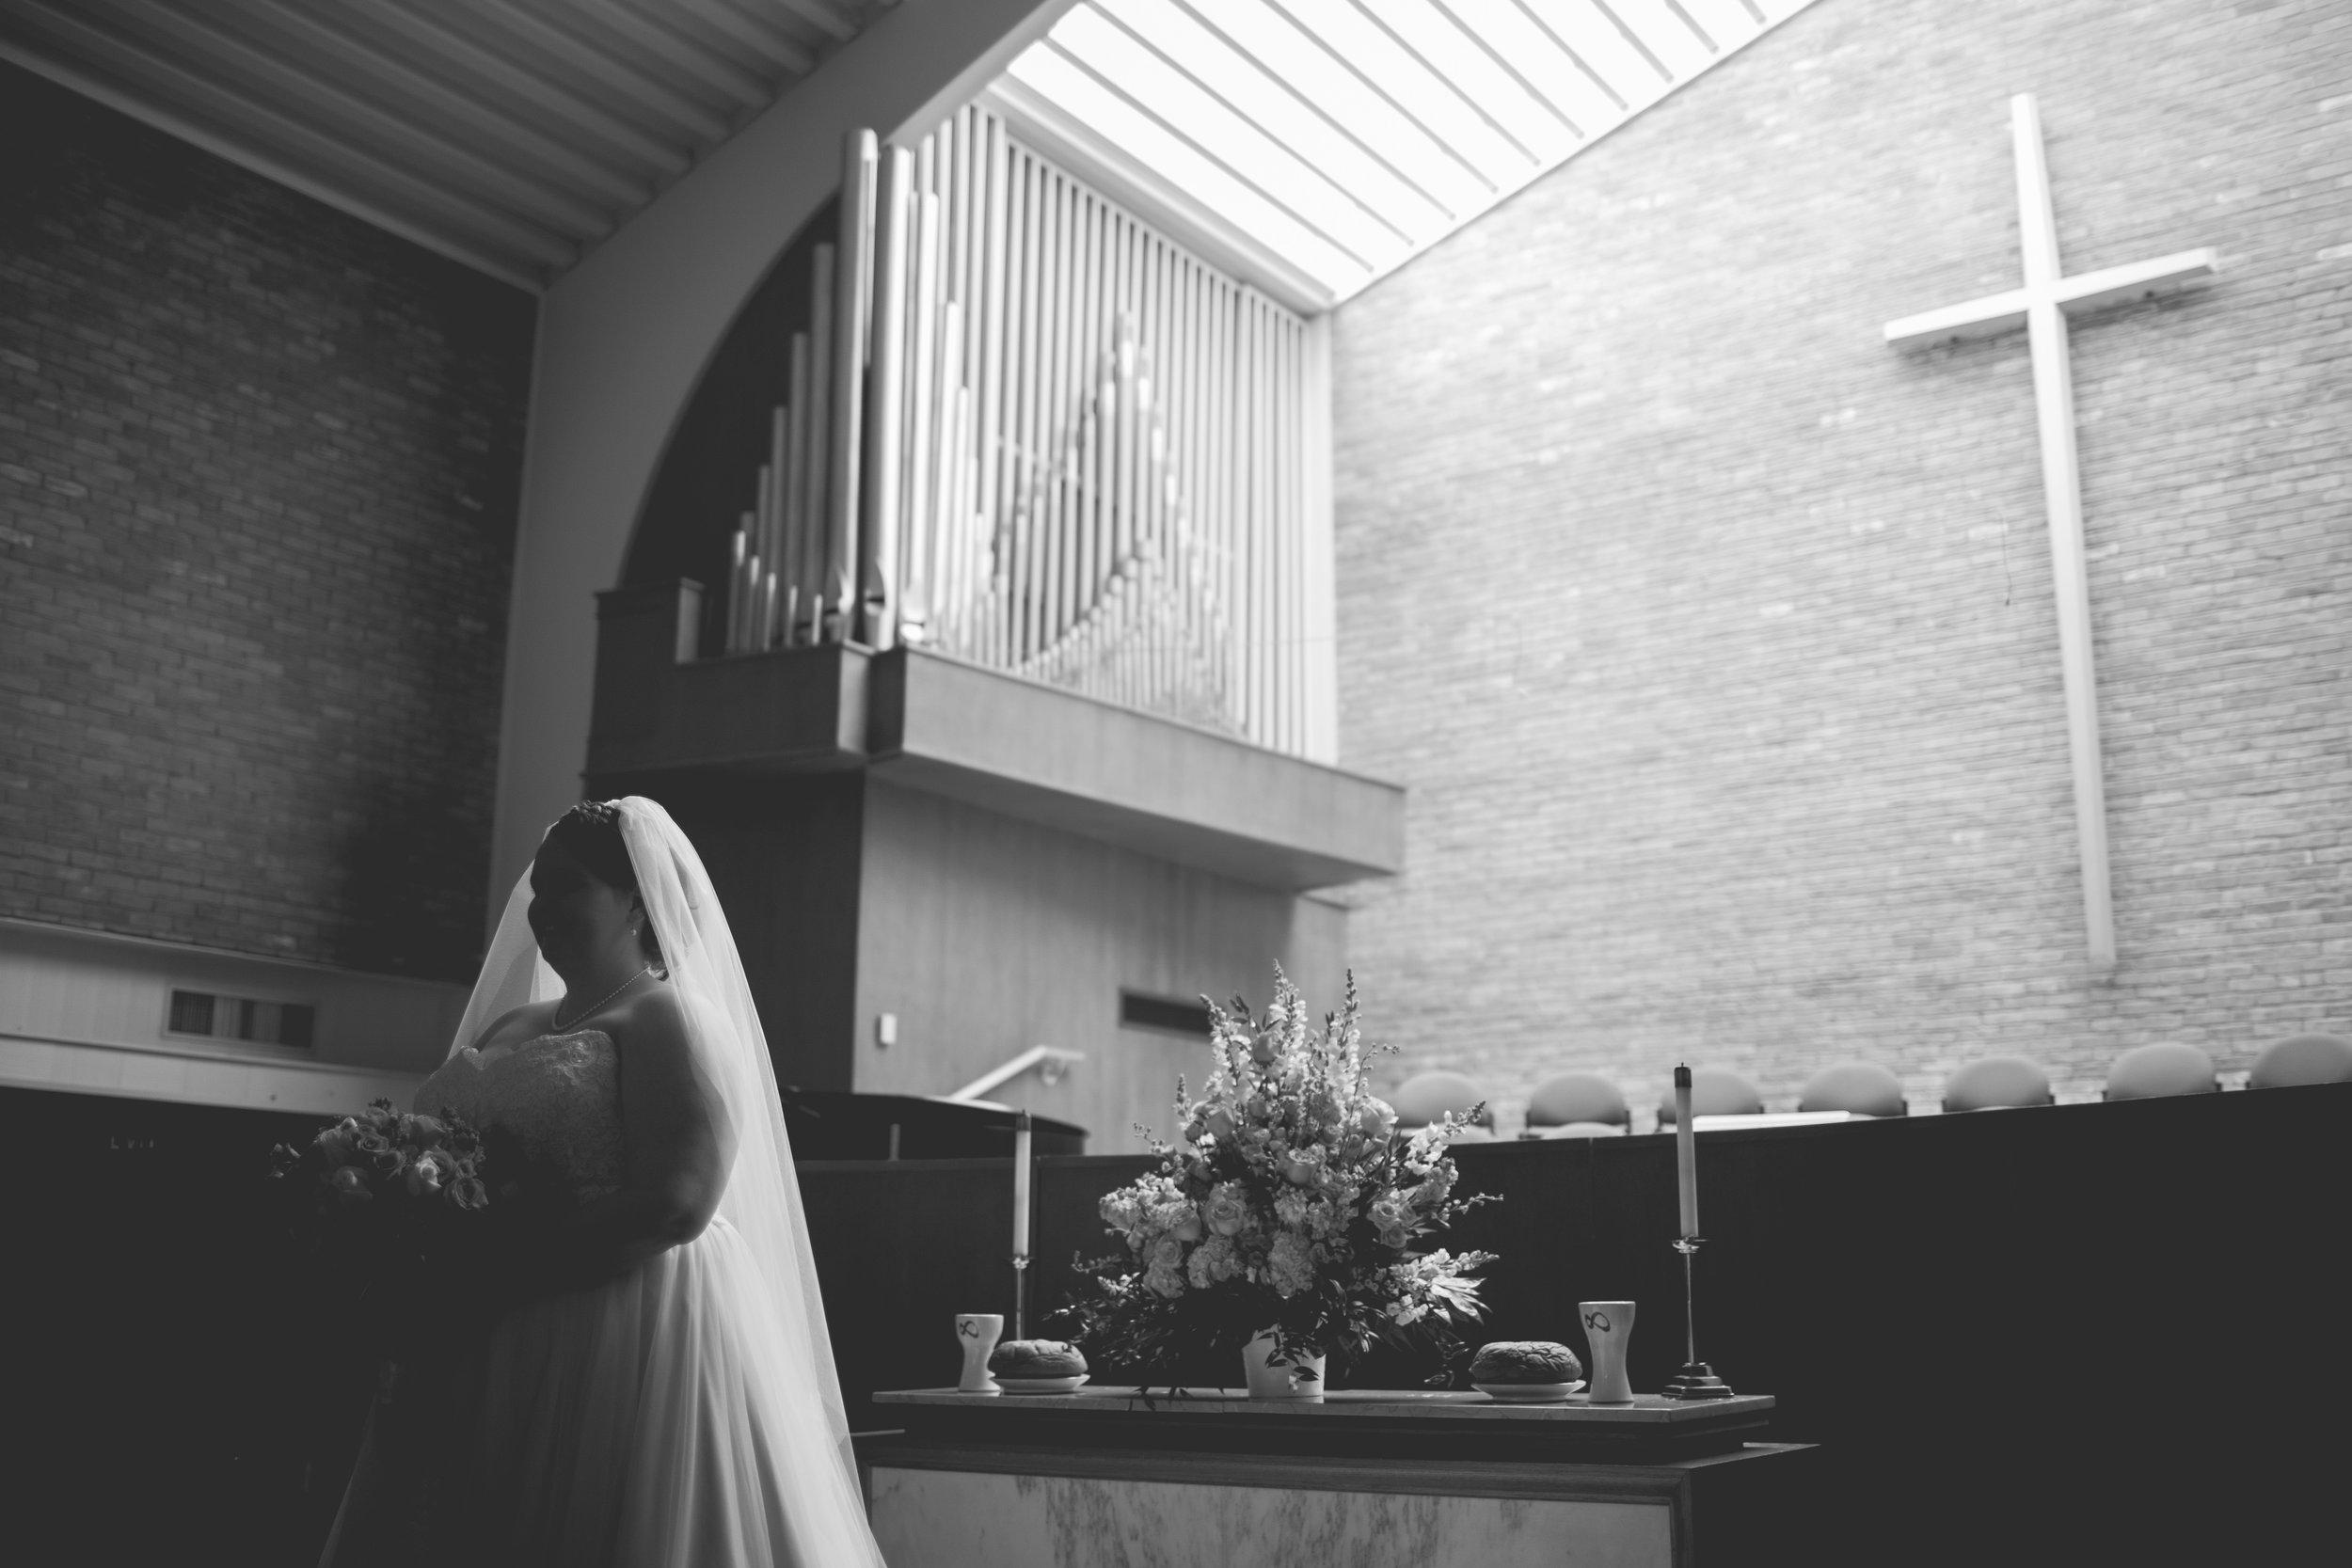 20170112-smith_wedding_full-110.jpg